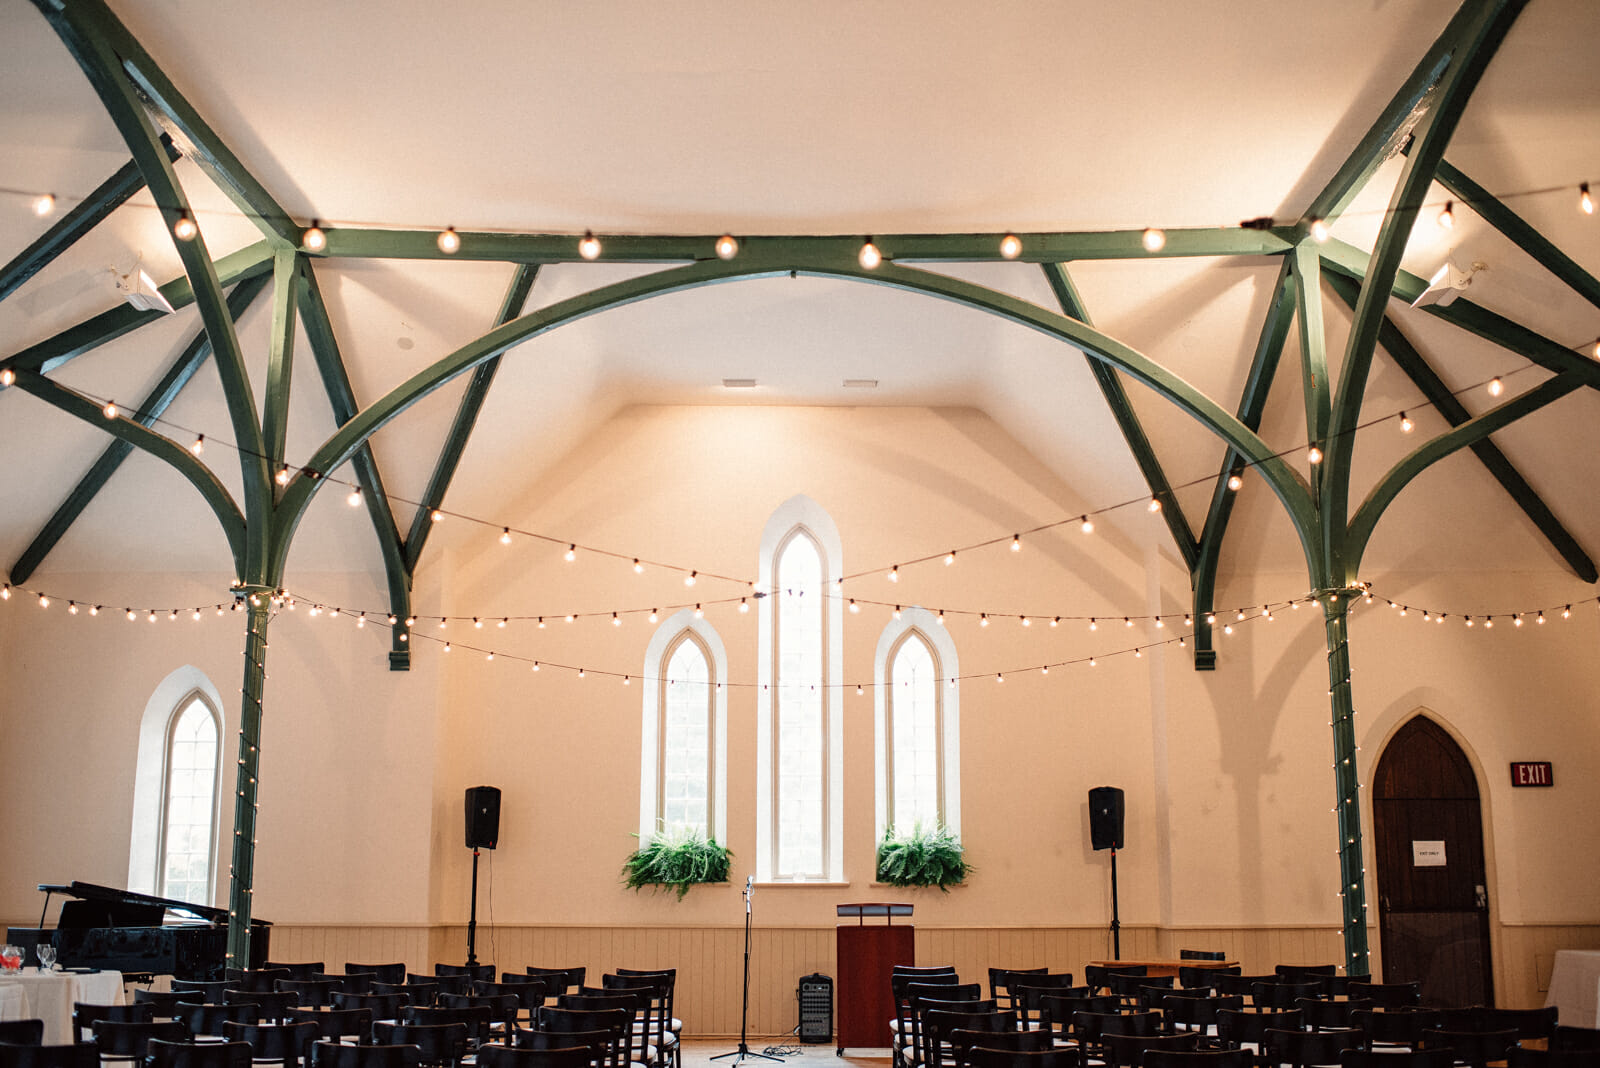 enoch turner schoolhouse set up for wedding ceremony